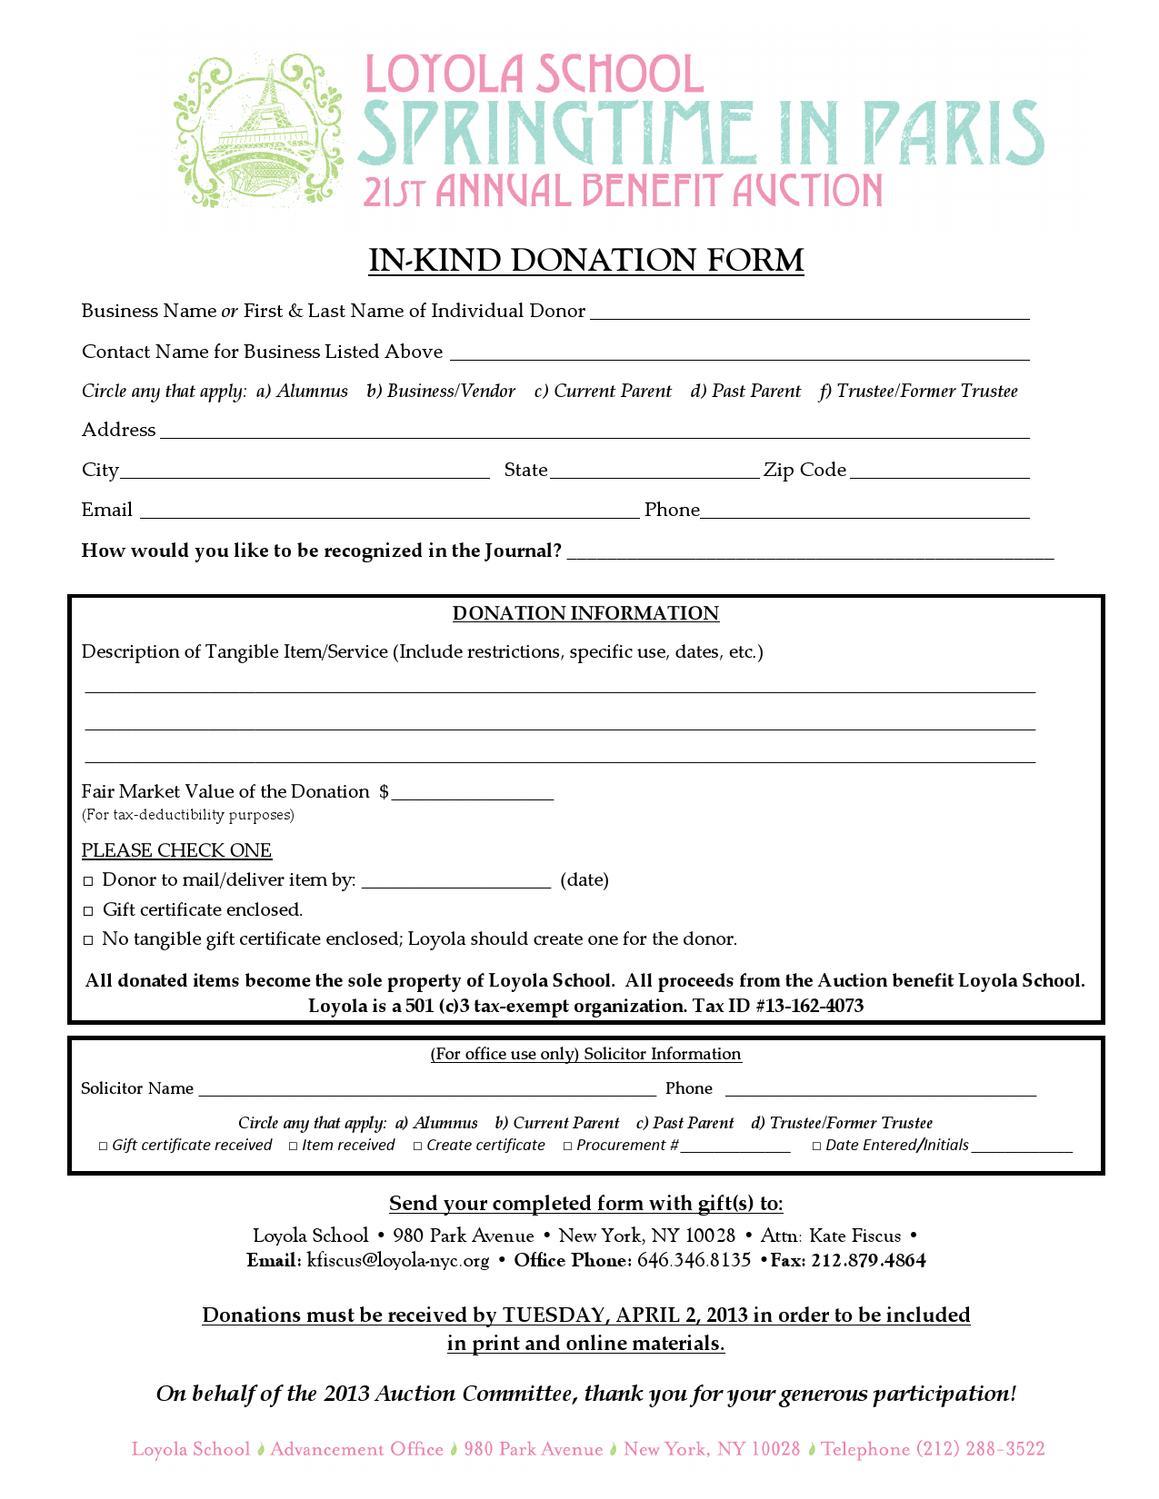 In Kind Donation Form By Loyola School Issuu